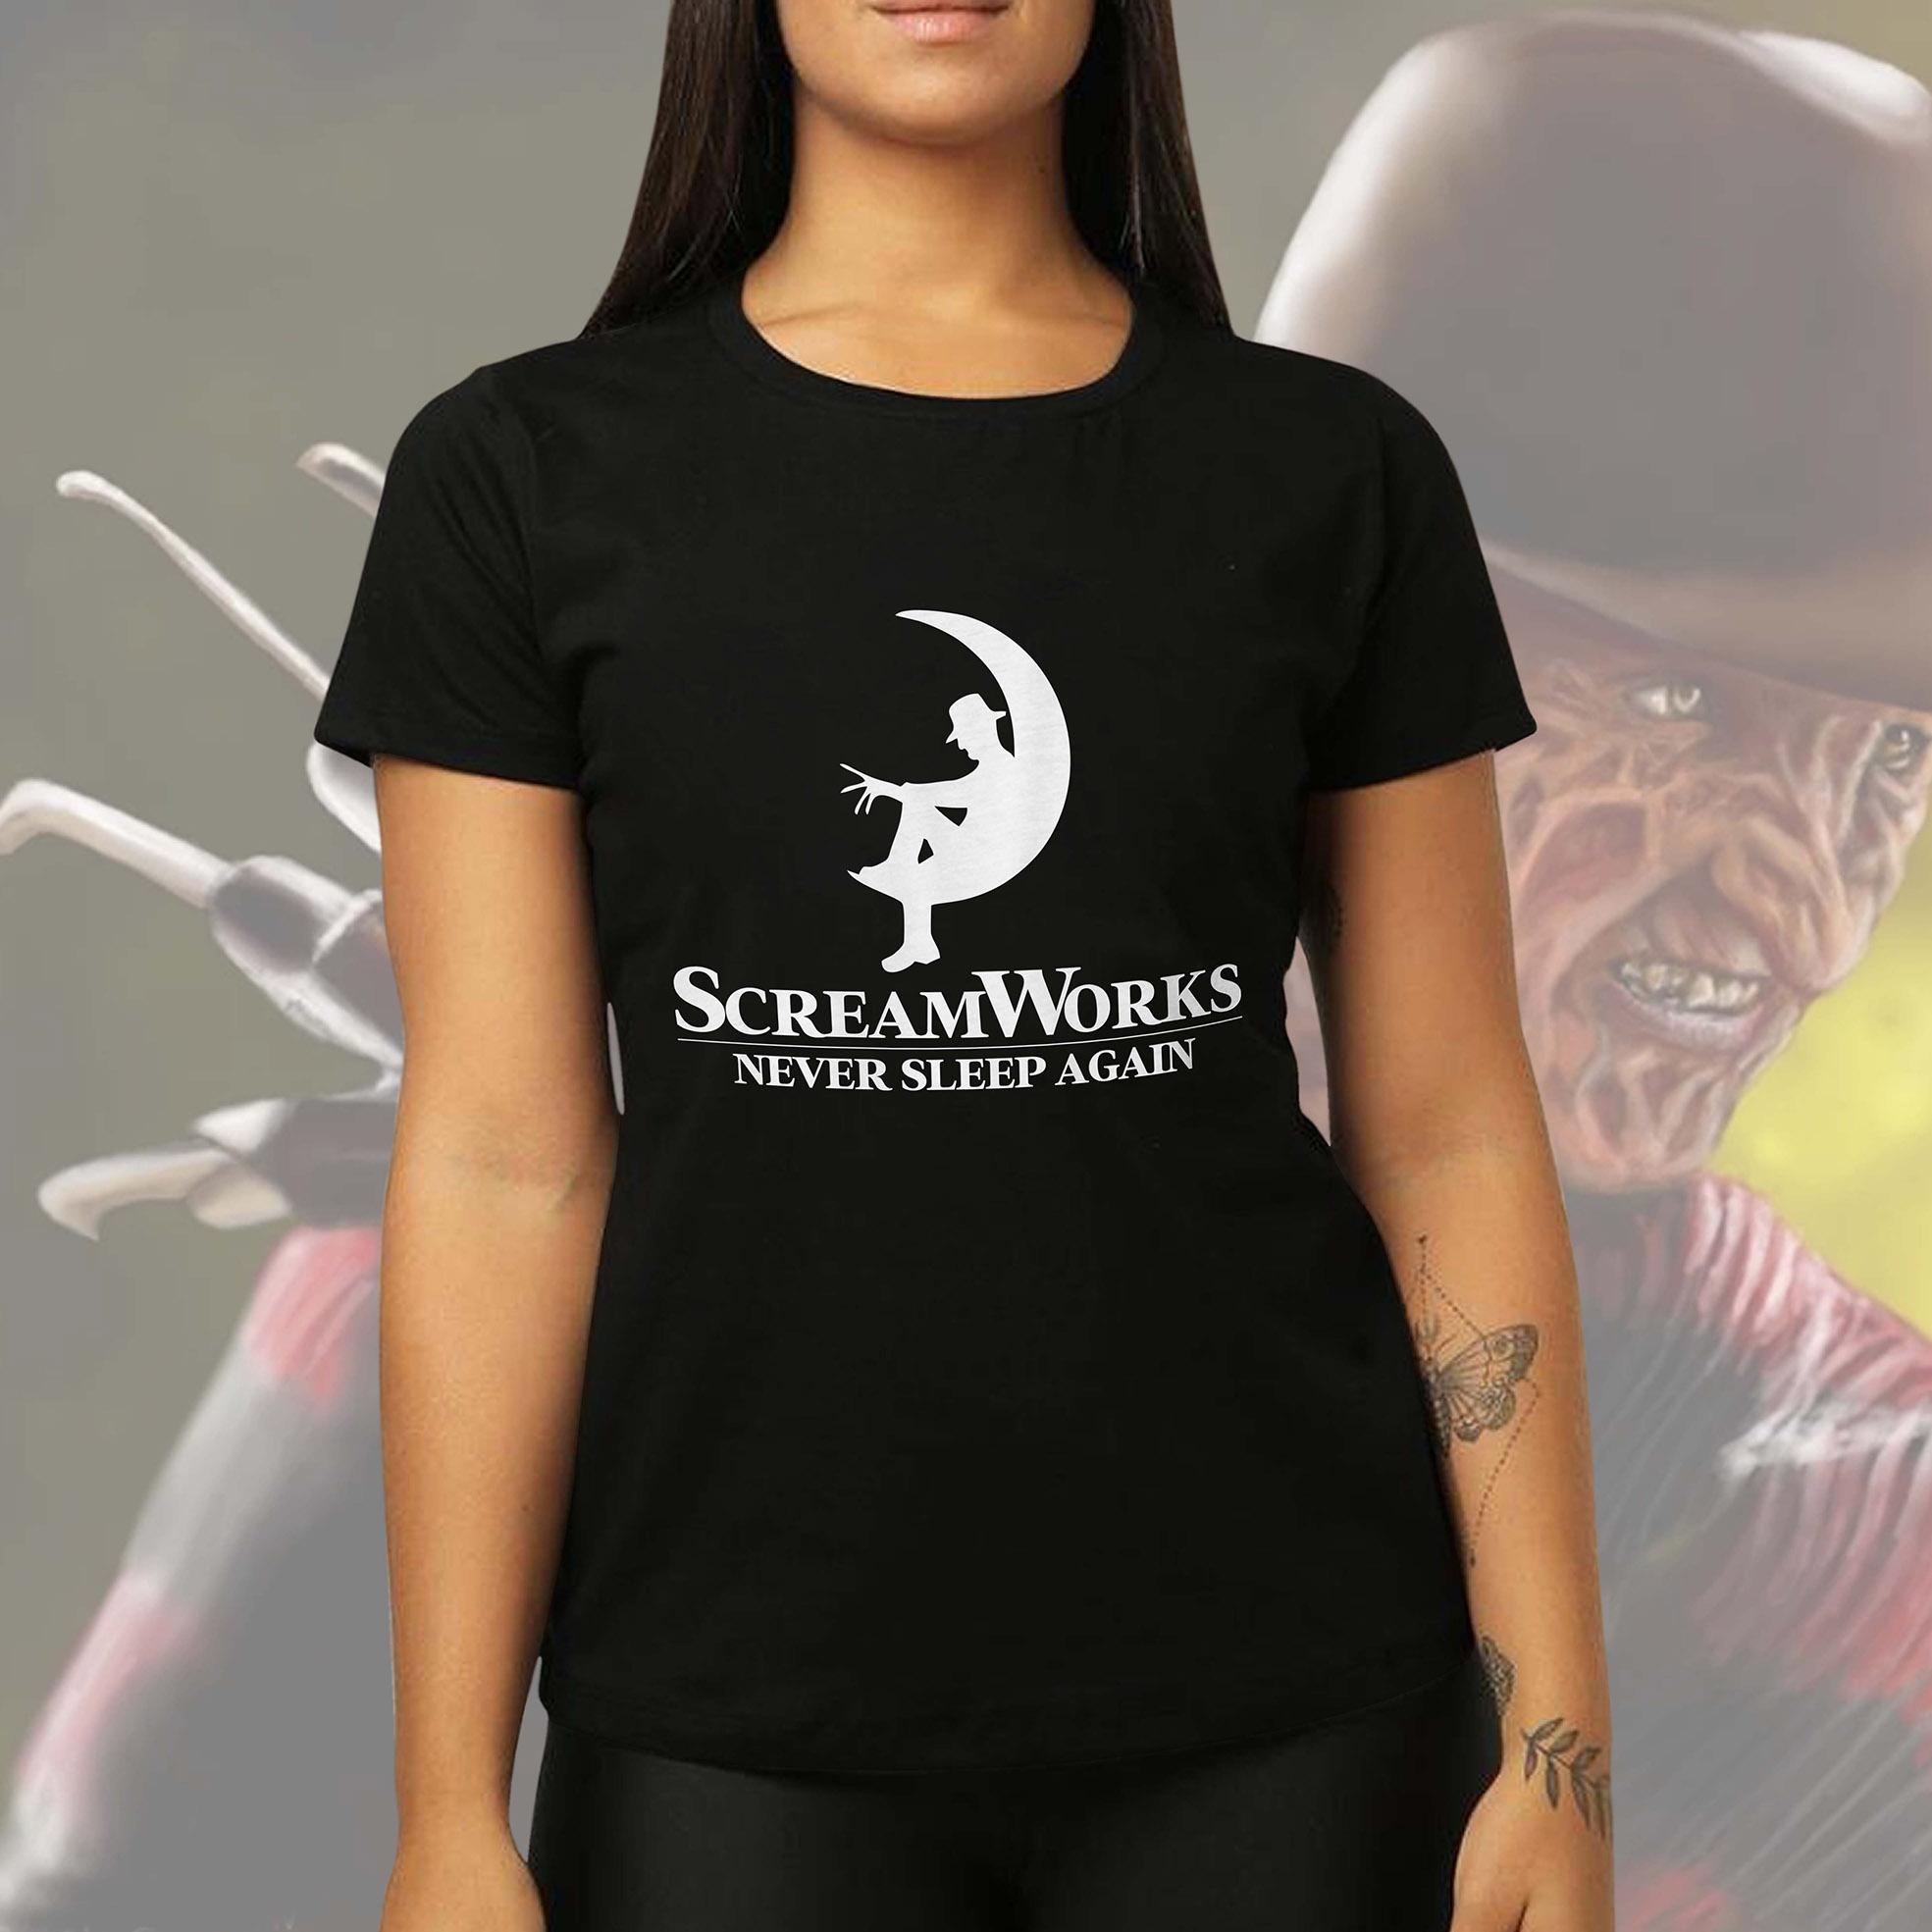 Camiseta Feminina Unissex Screamworks Never Sleep Again Freddy Krueger Terror Halloween (Preta) - EV